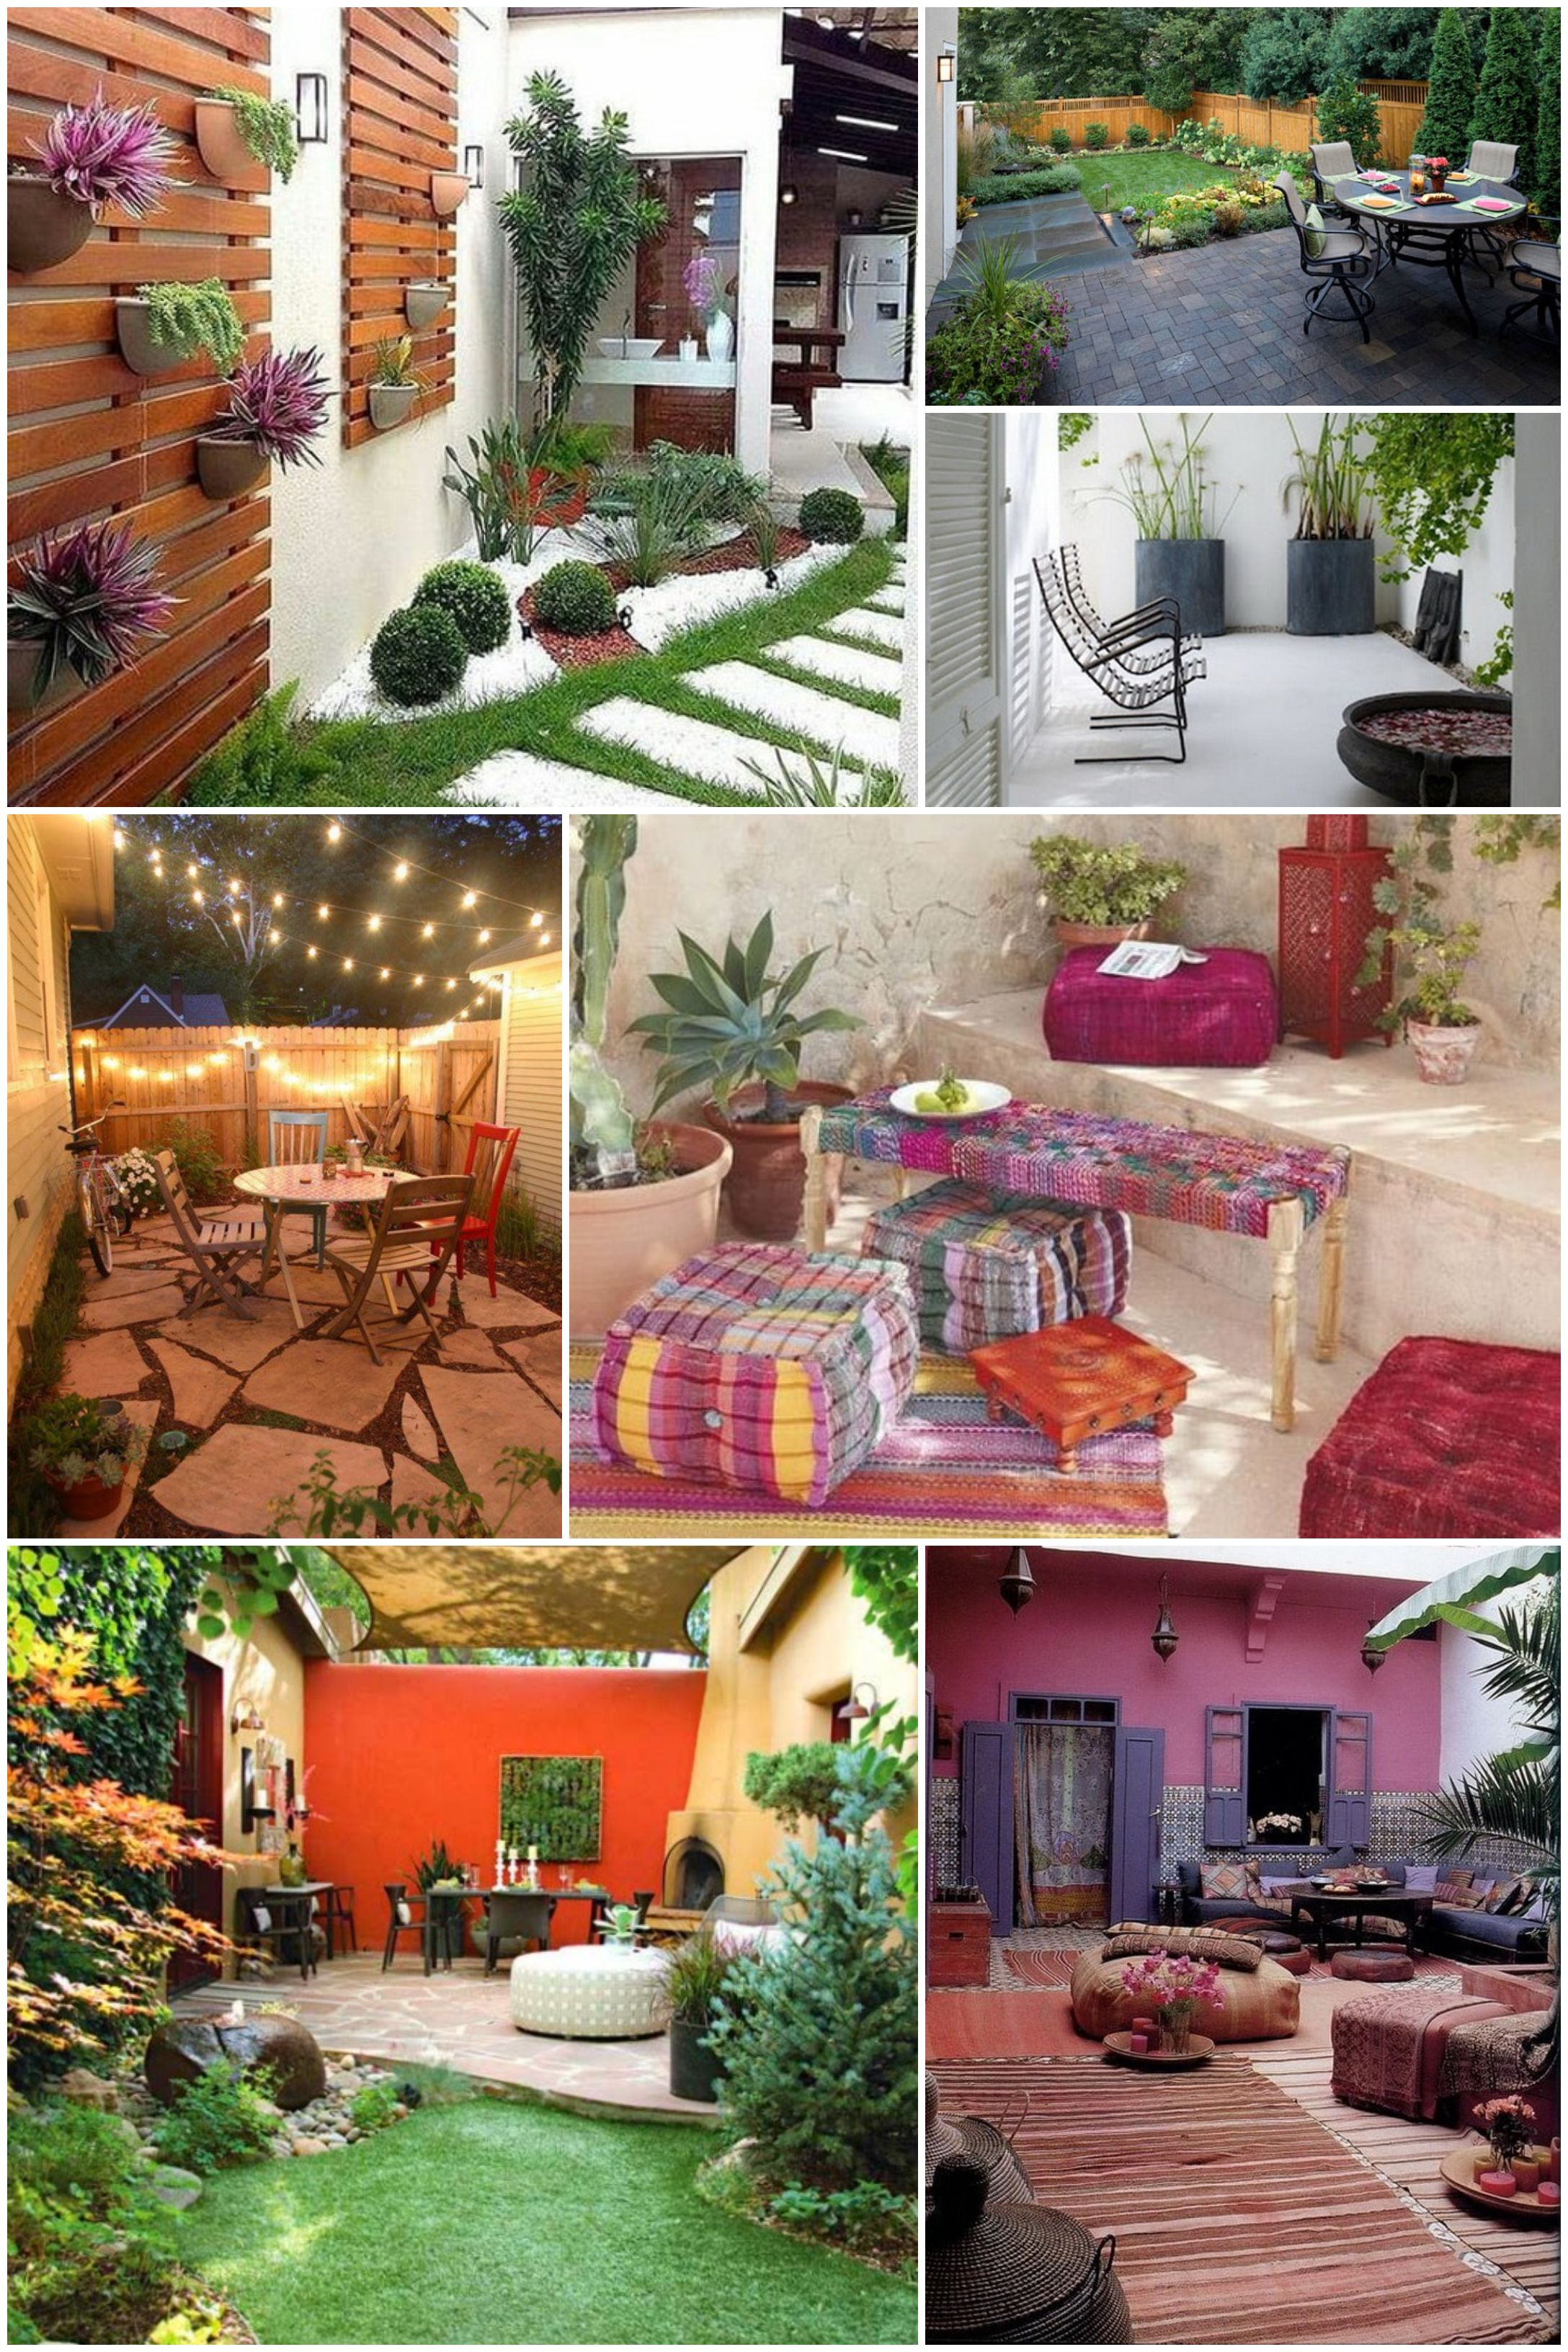 Ideas Para Patios Pequenos Decoracion De Jardines Pequenos Decorar Patio Pequeno Decorar Jardines Pequenos Decoracion Jardines Pequenos